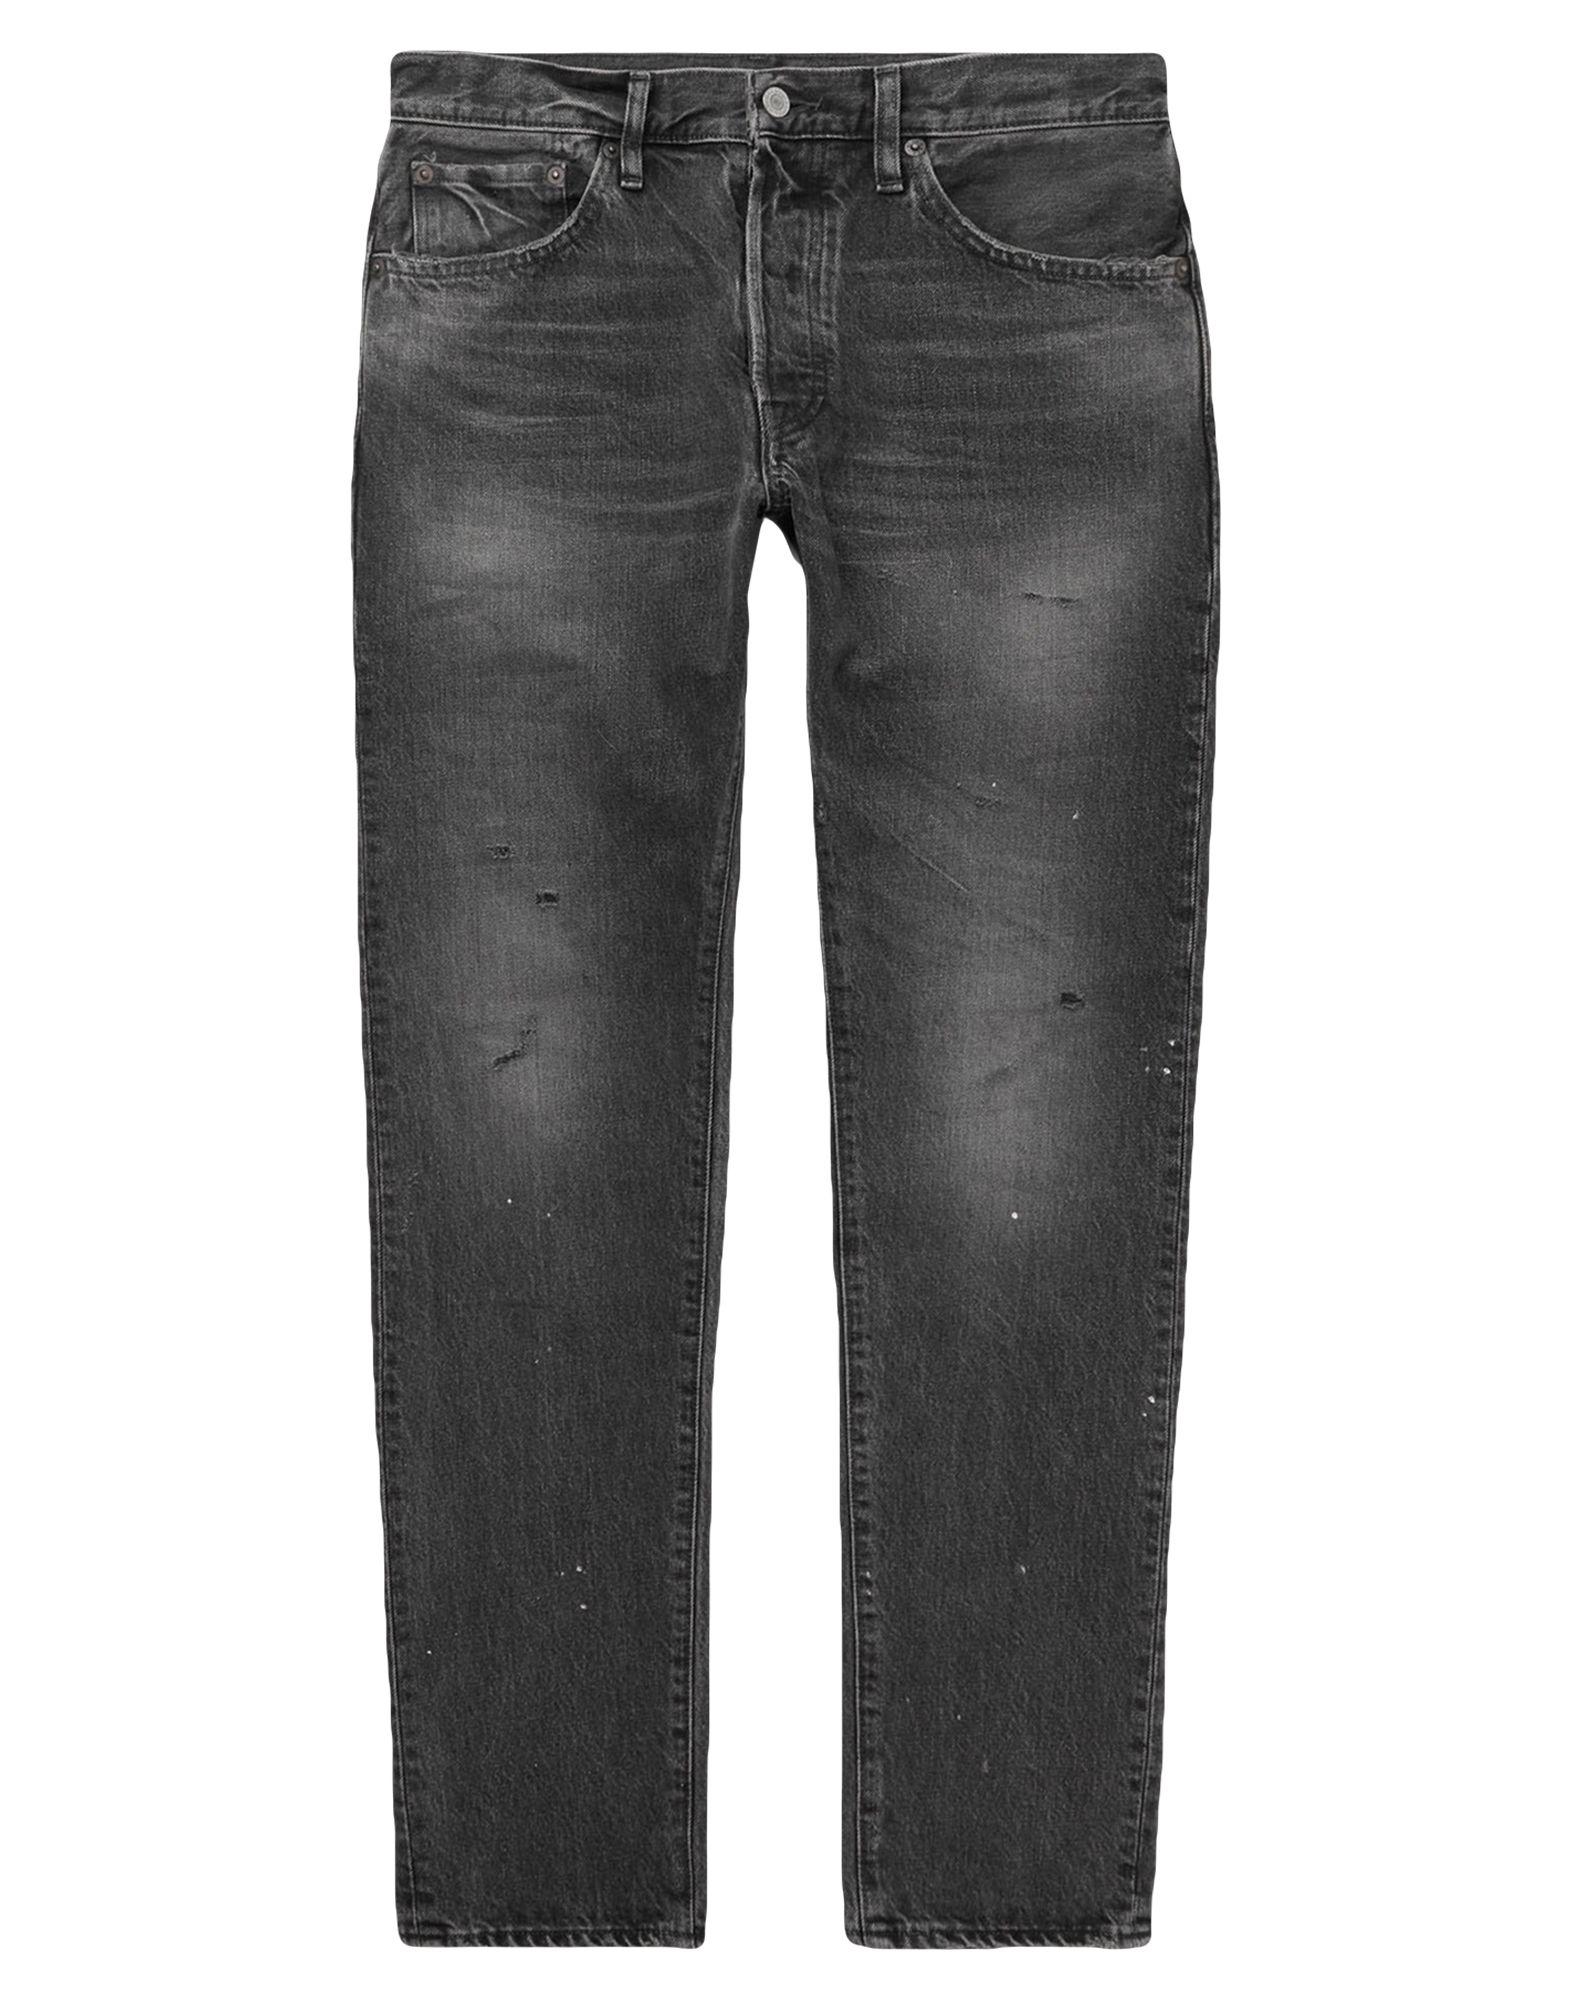 Фото - FABRIC-BRAND & CO. Джинсовые брюки fabric brand